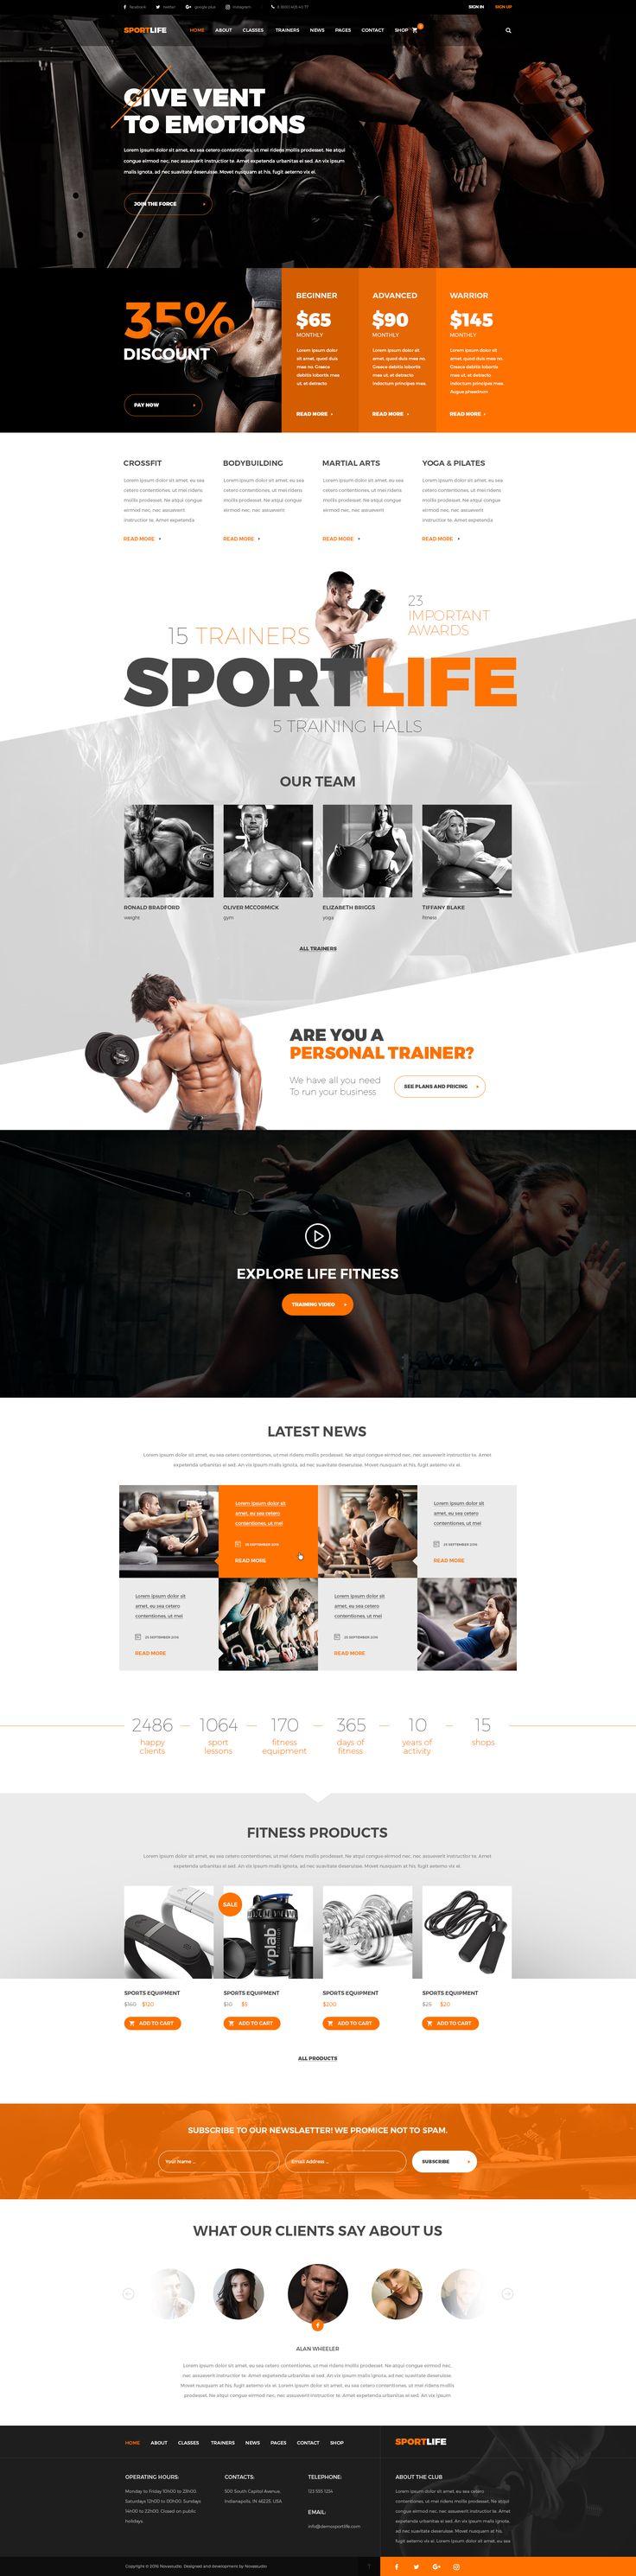 SportLife - Sport, Gym, Fitness PSD Template • Download ➝ https://themeforest.net/item/sportlife-sport-gym-fitness-psd-template/17896756?ref=pxcr